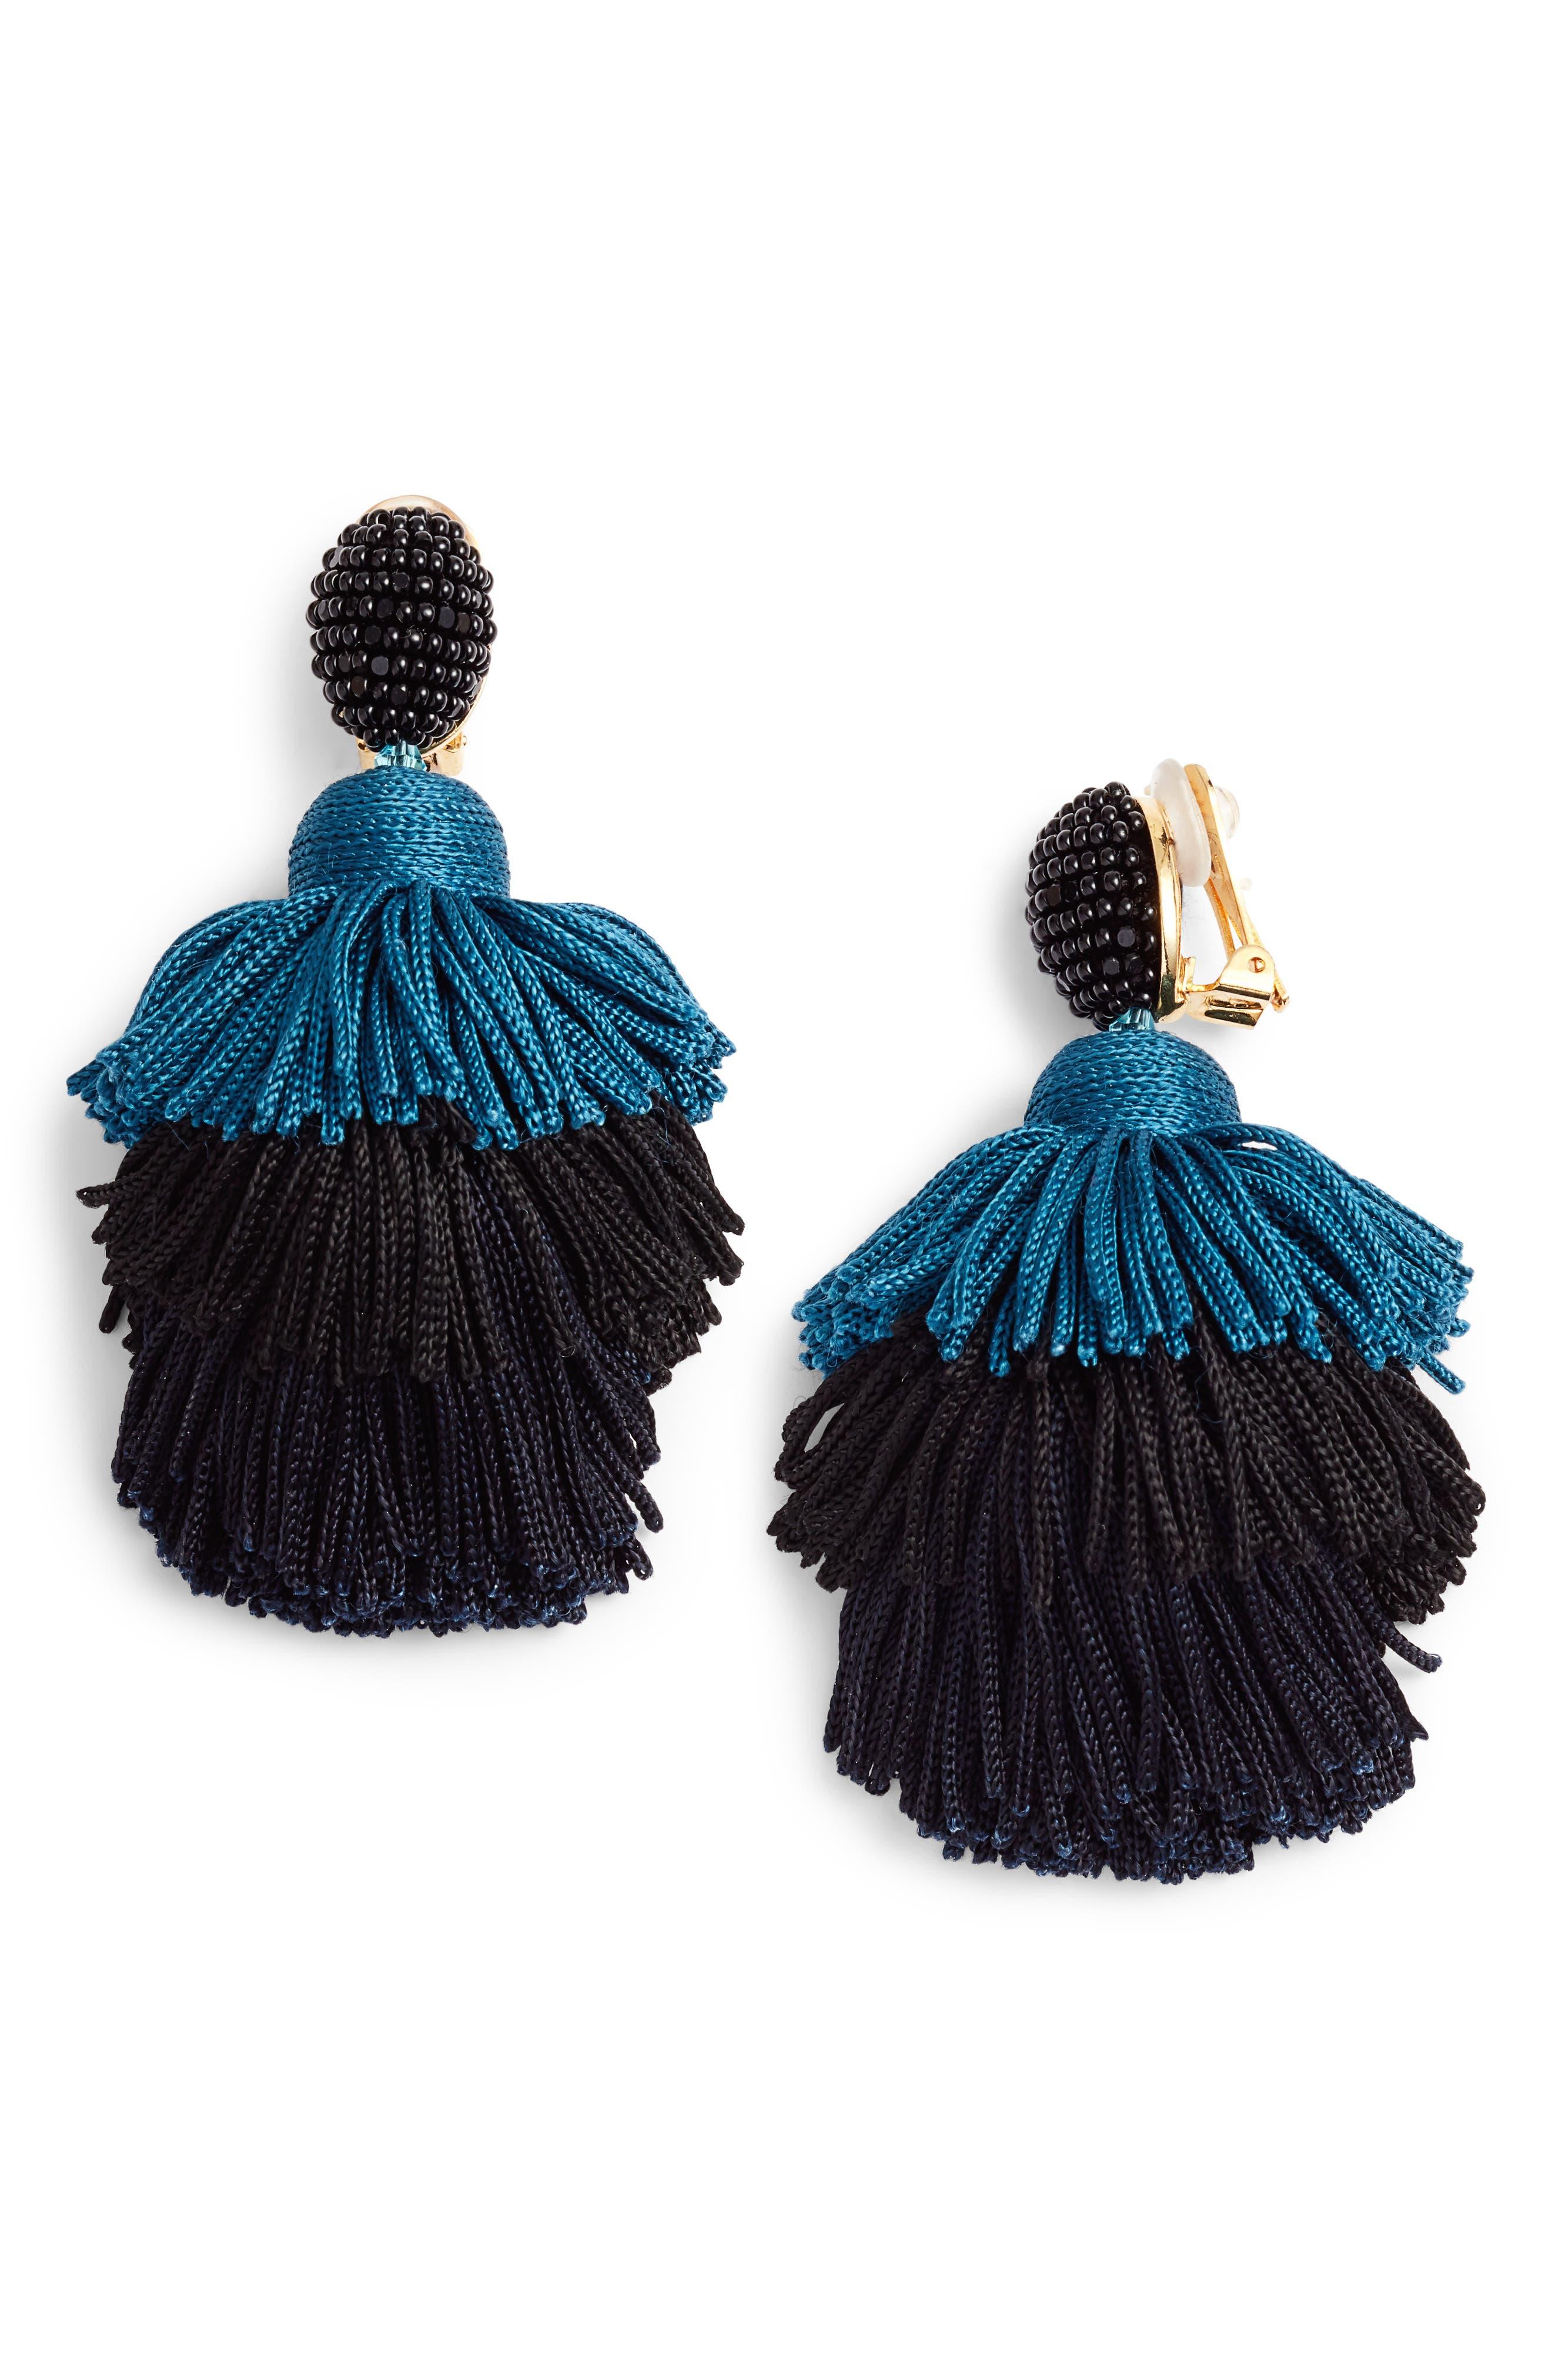 Tiered Tassel Drop Earrings,                             Main thumbnail 1, color,                             BLACK/ BLUE